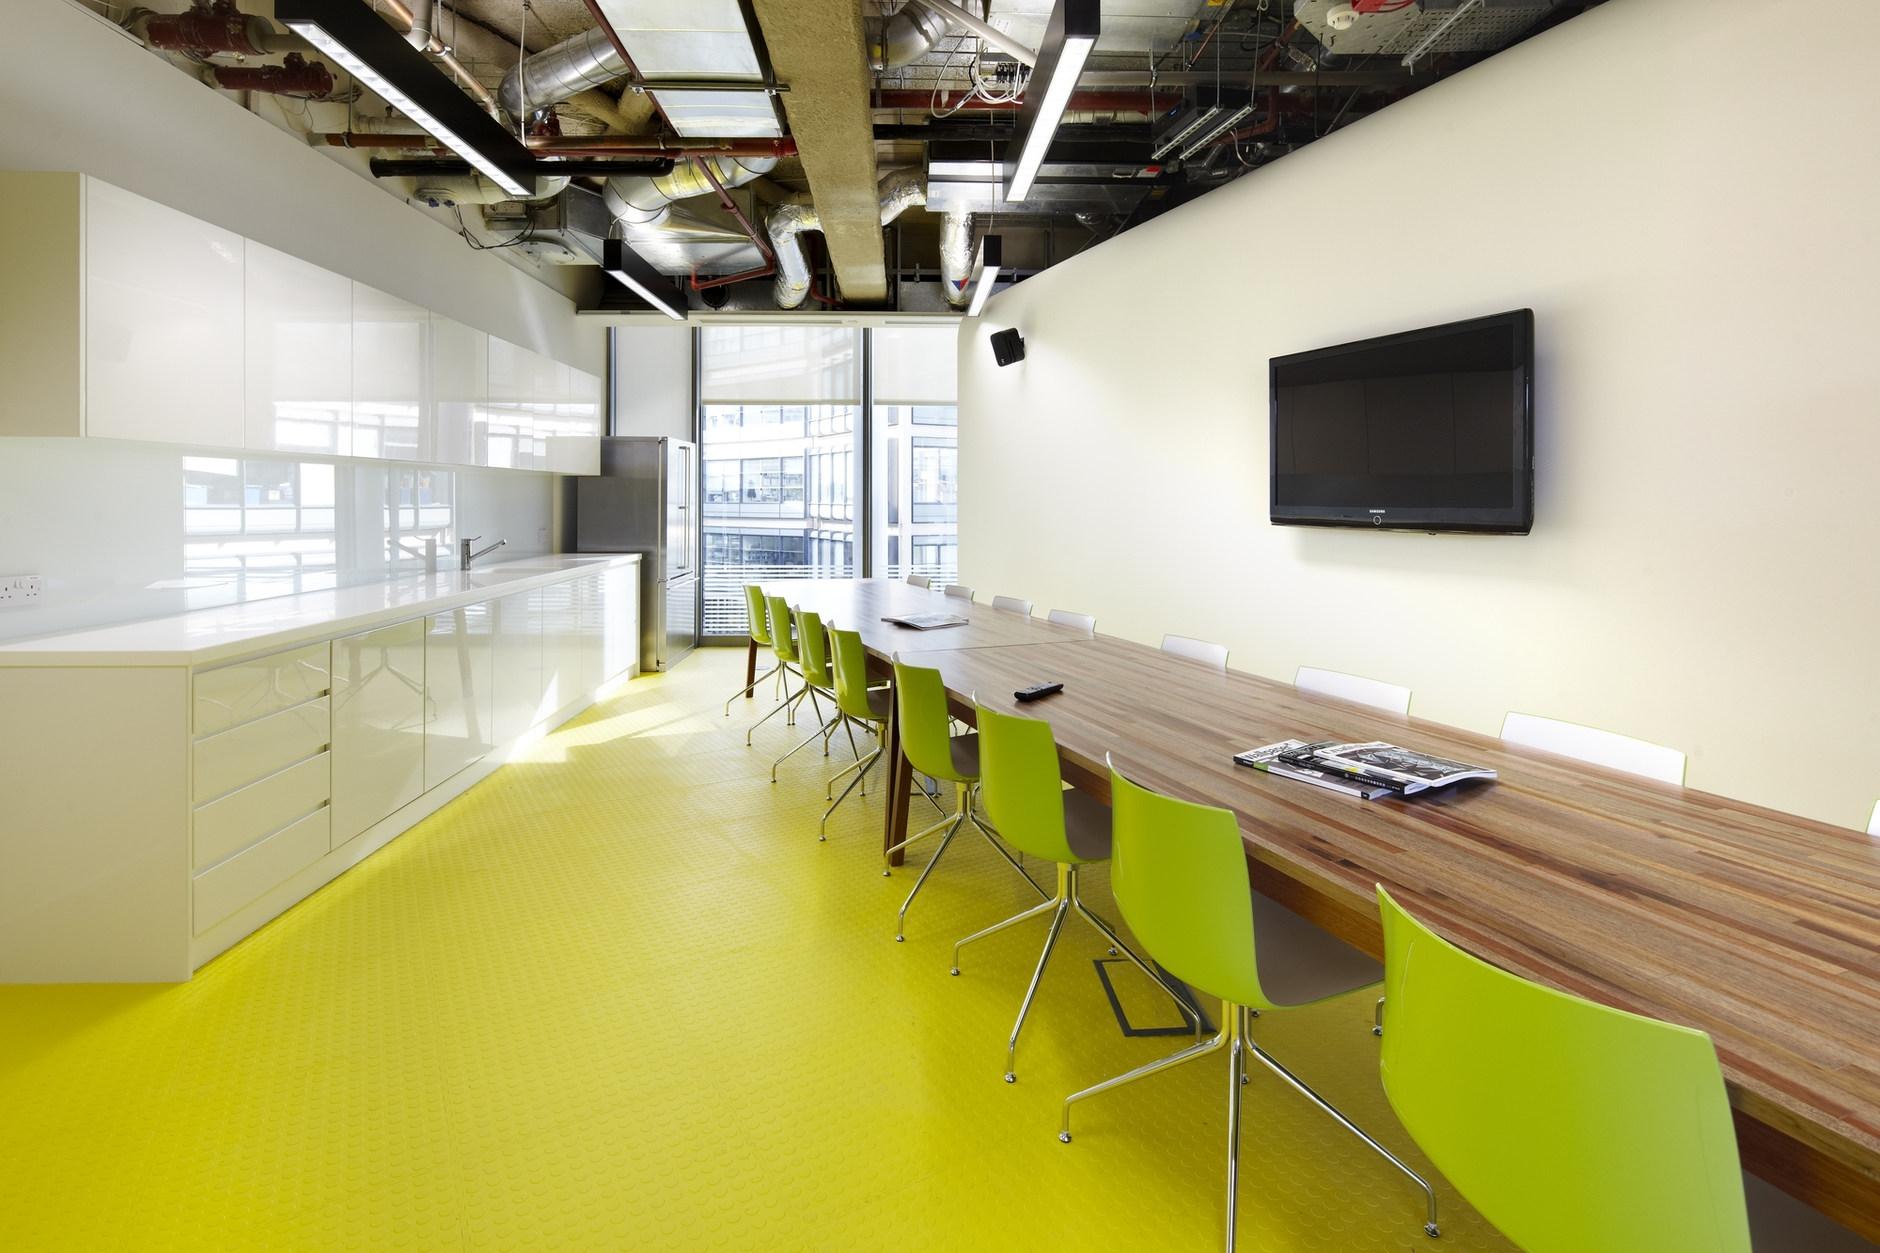 Design studio hq by archer architects karmatrendz for Fotos de oficinas modernas